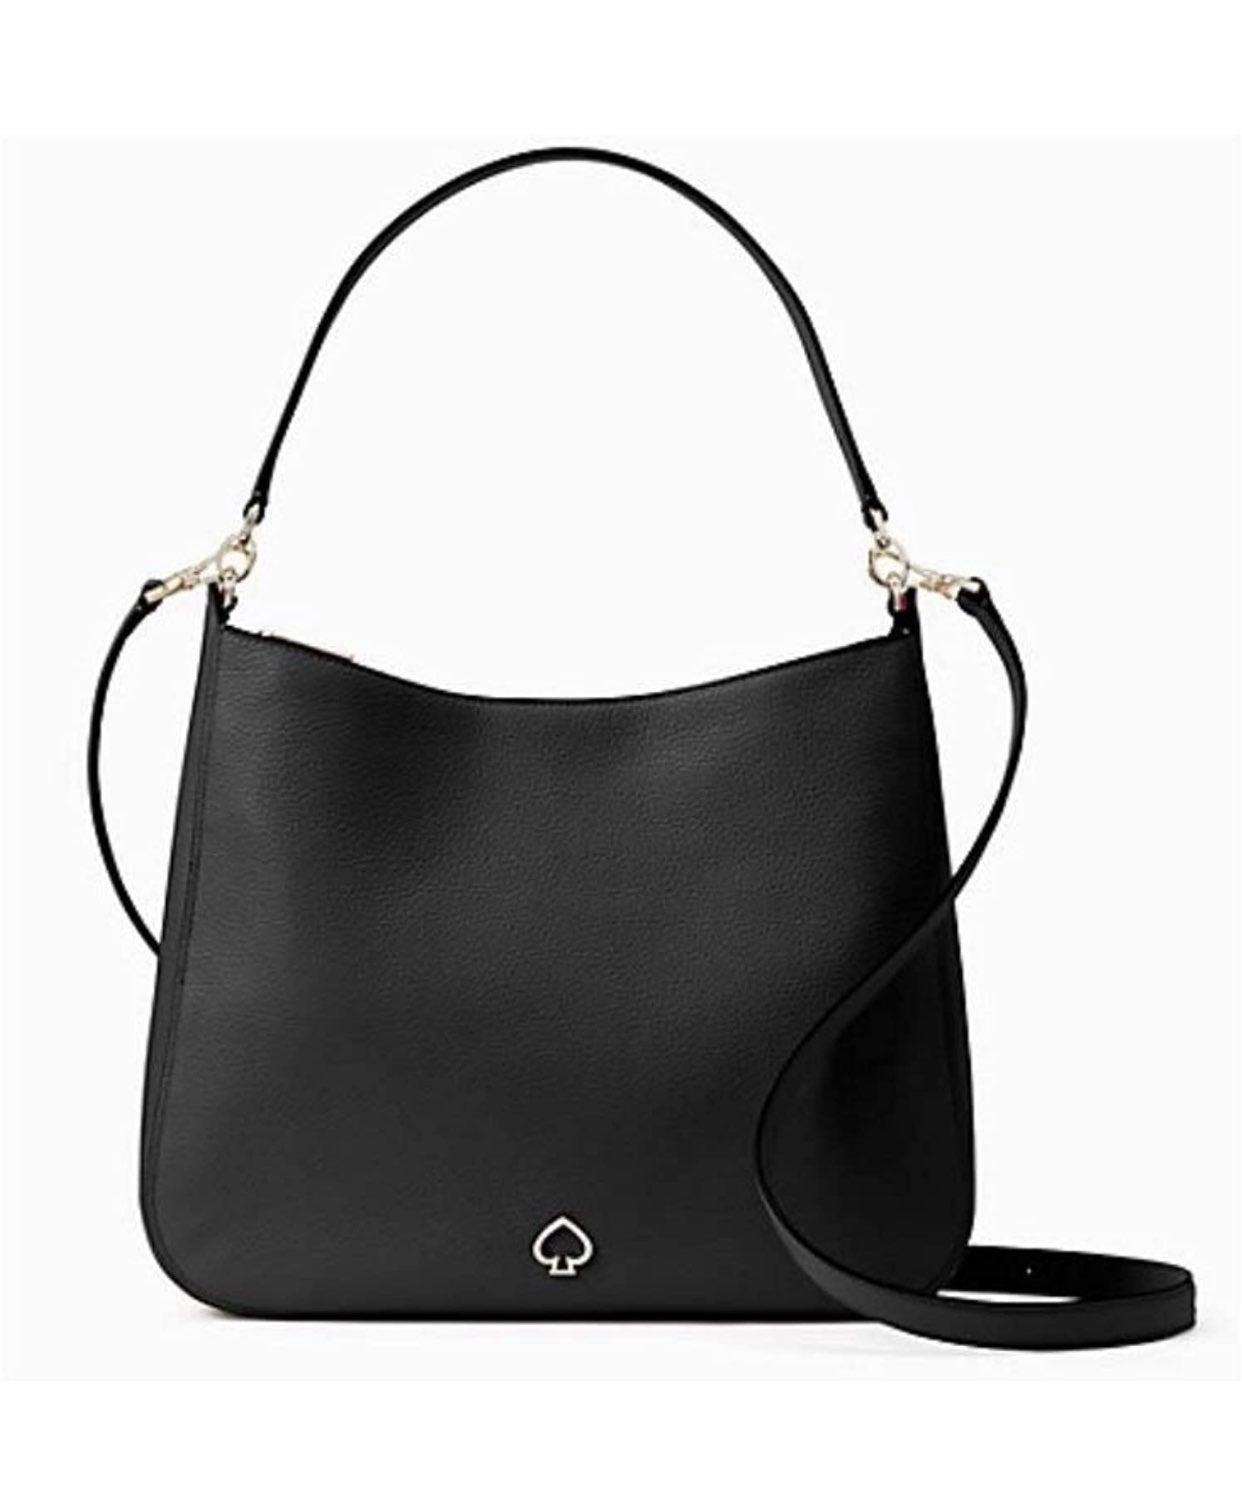 Kate Spade New York Black Leather Should